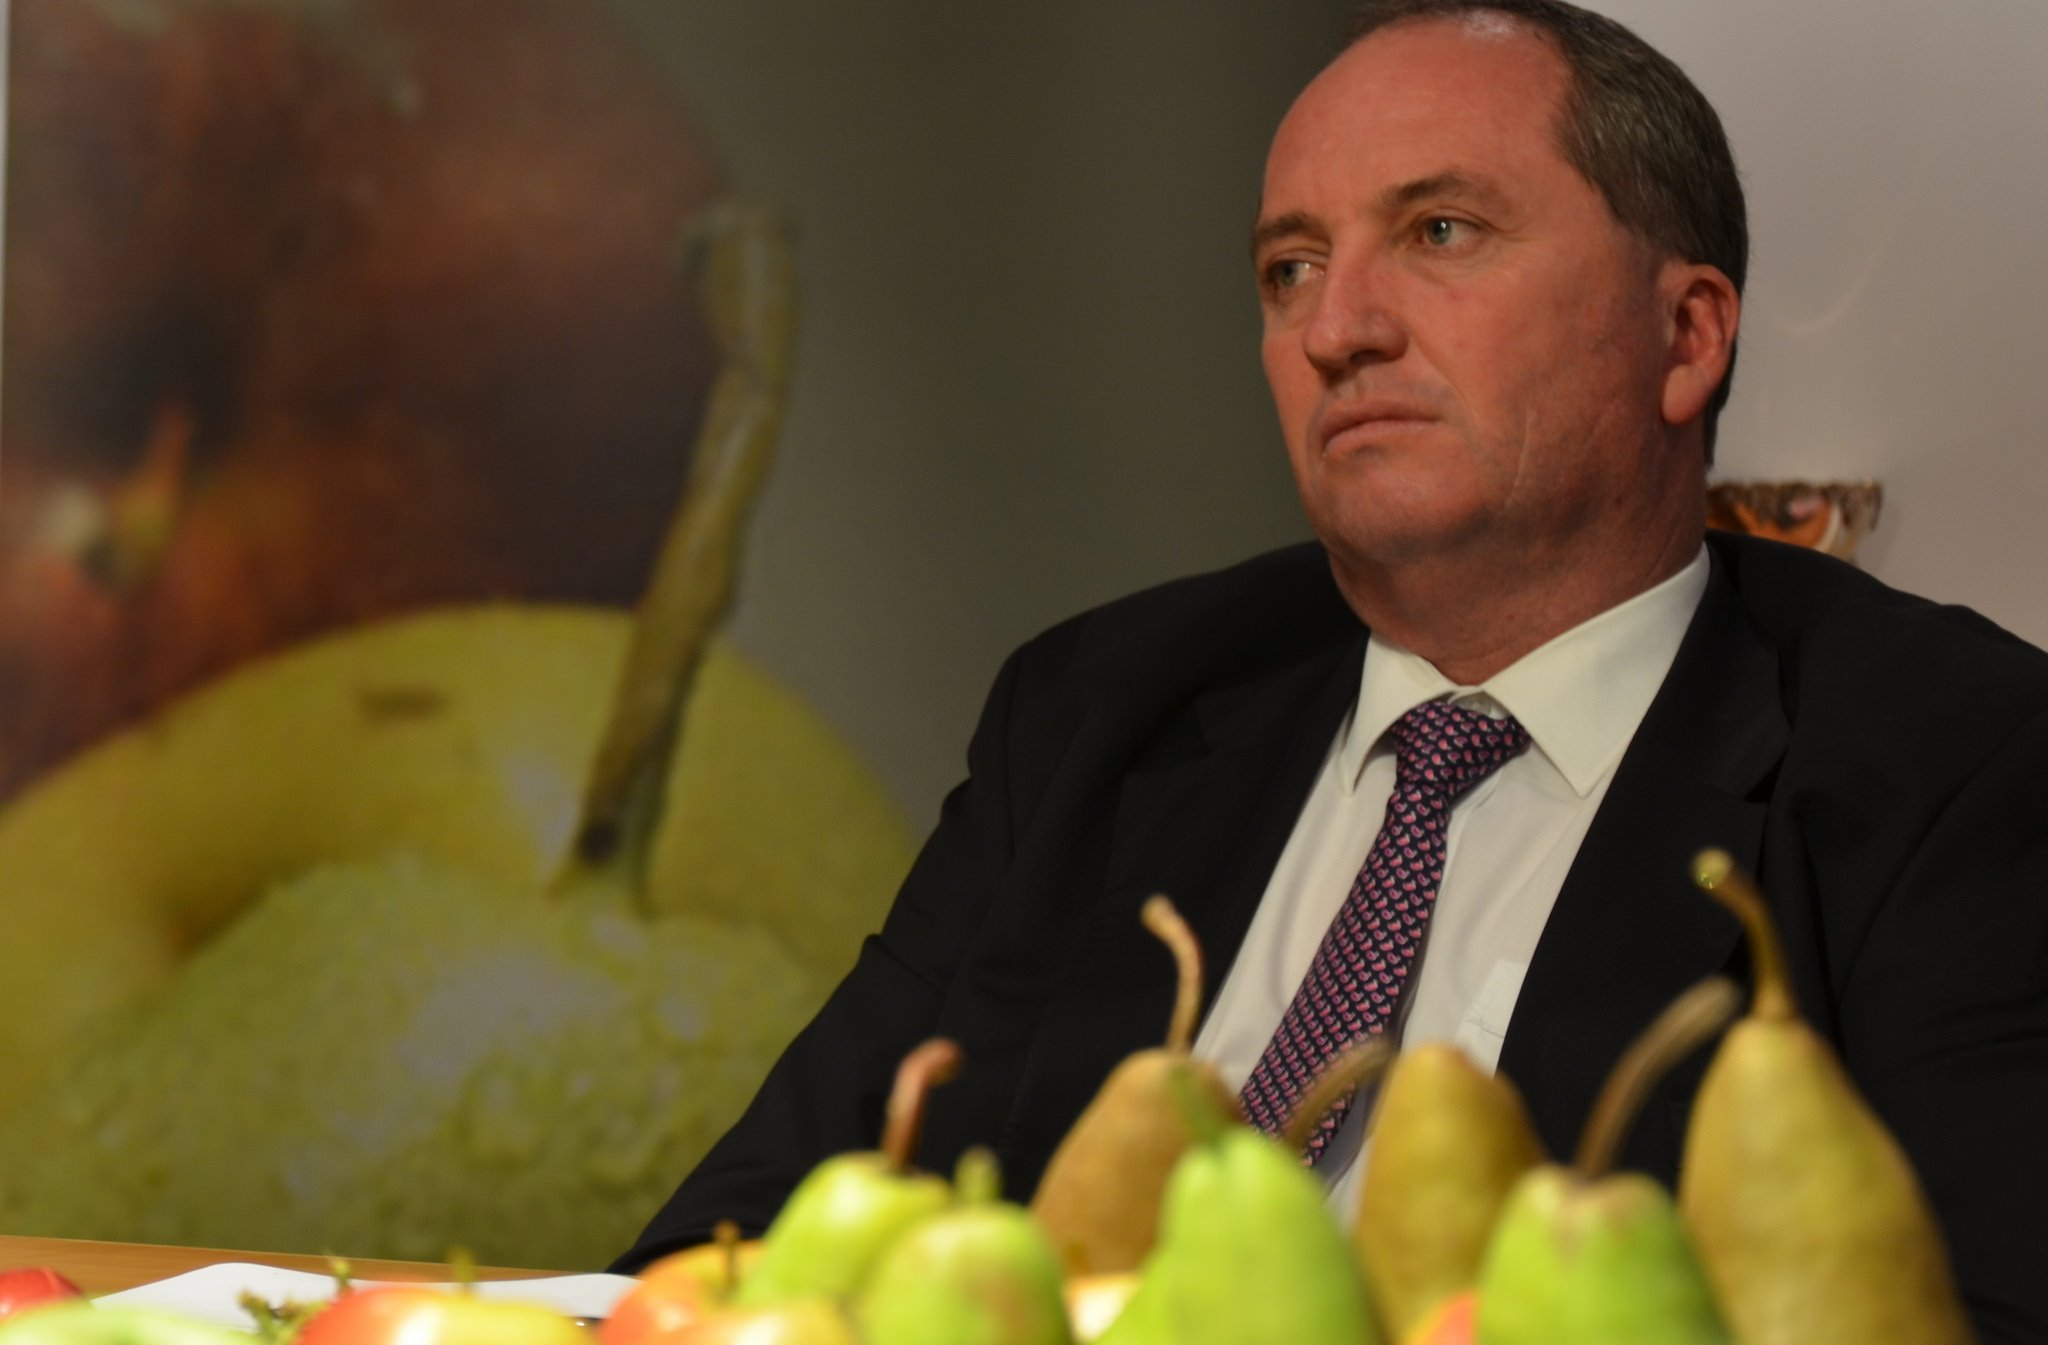 Barnaby Joyce in 2014. (Flickr/Apple and Pear Australia)